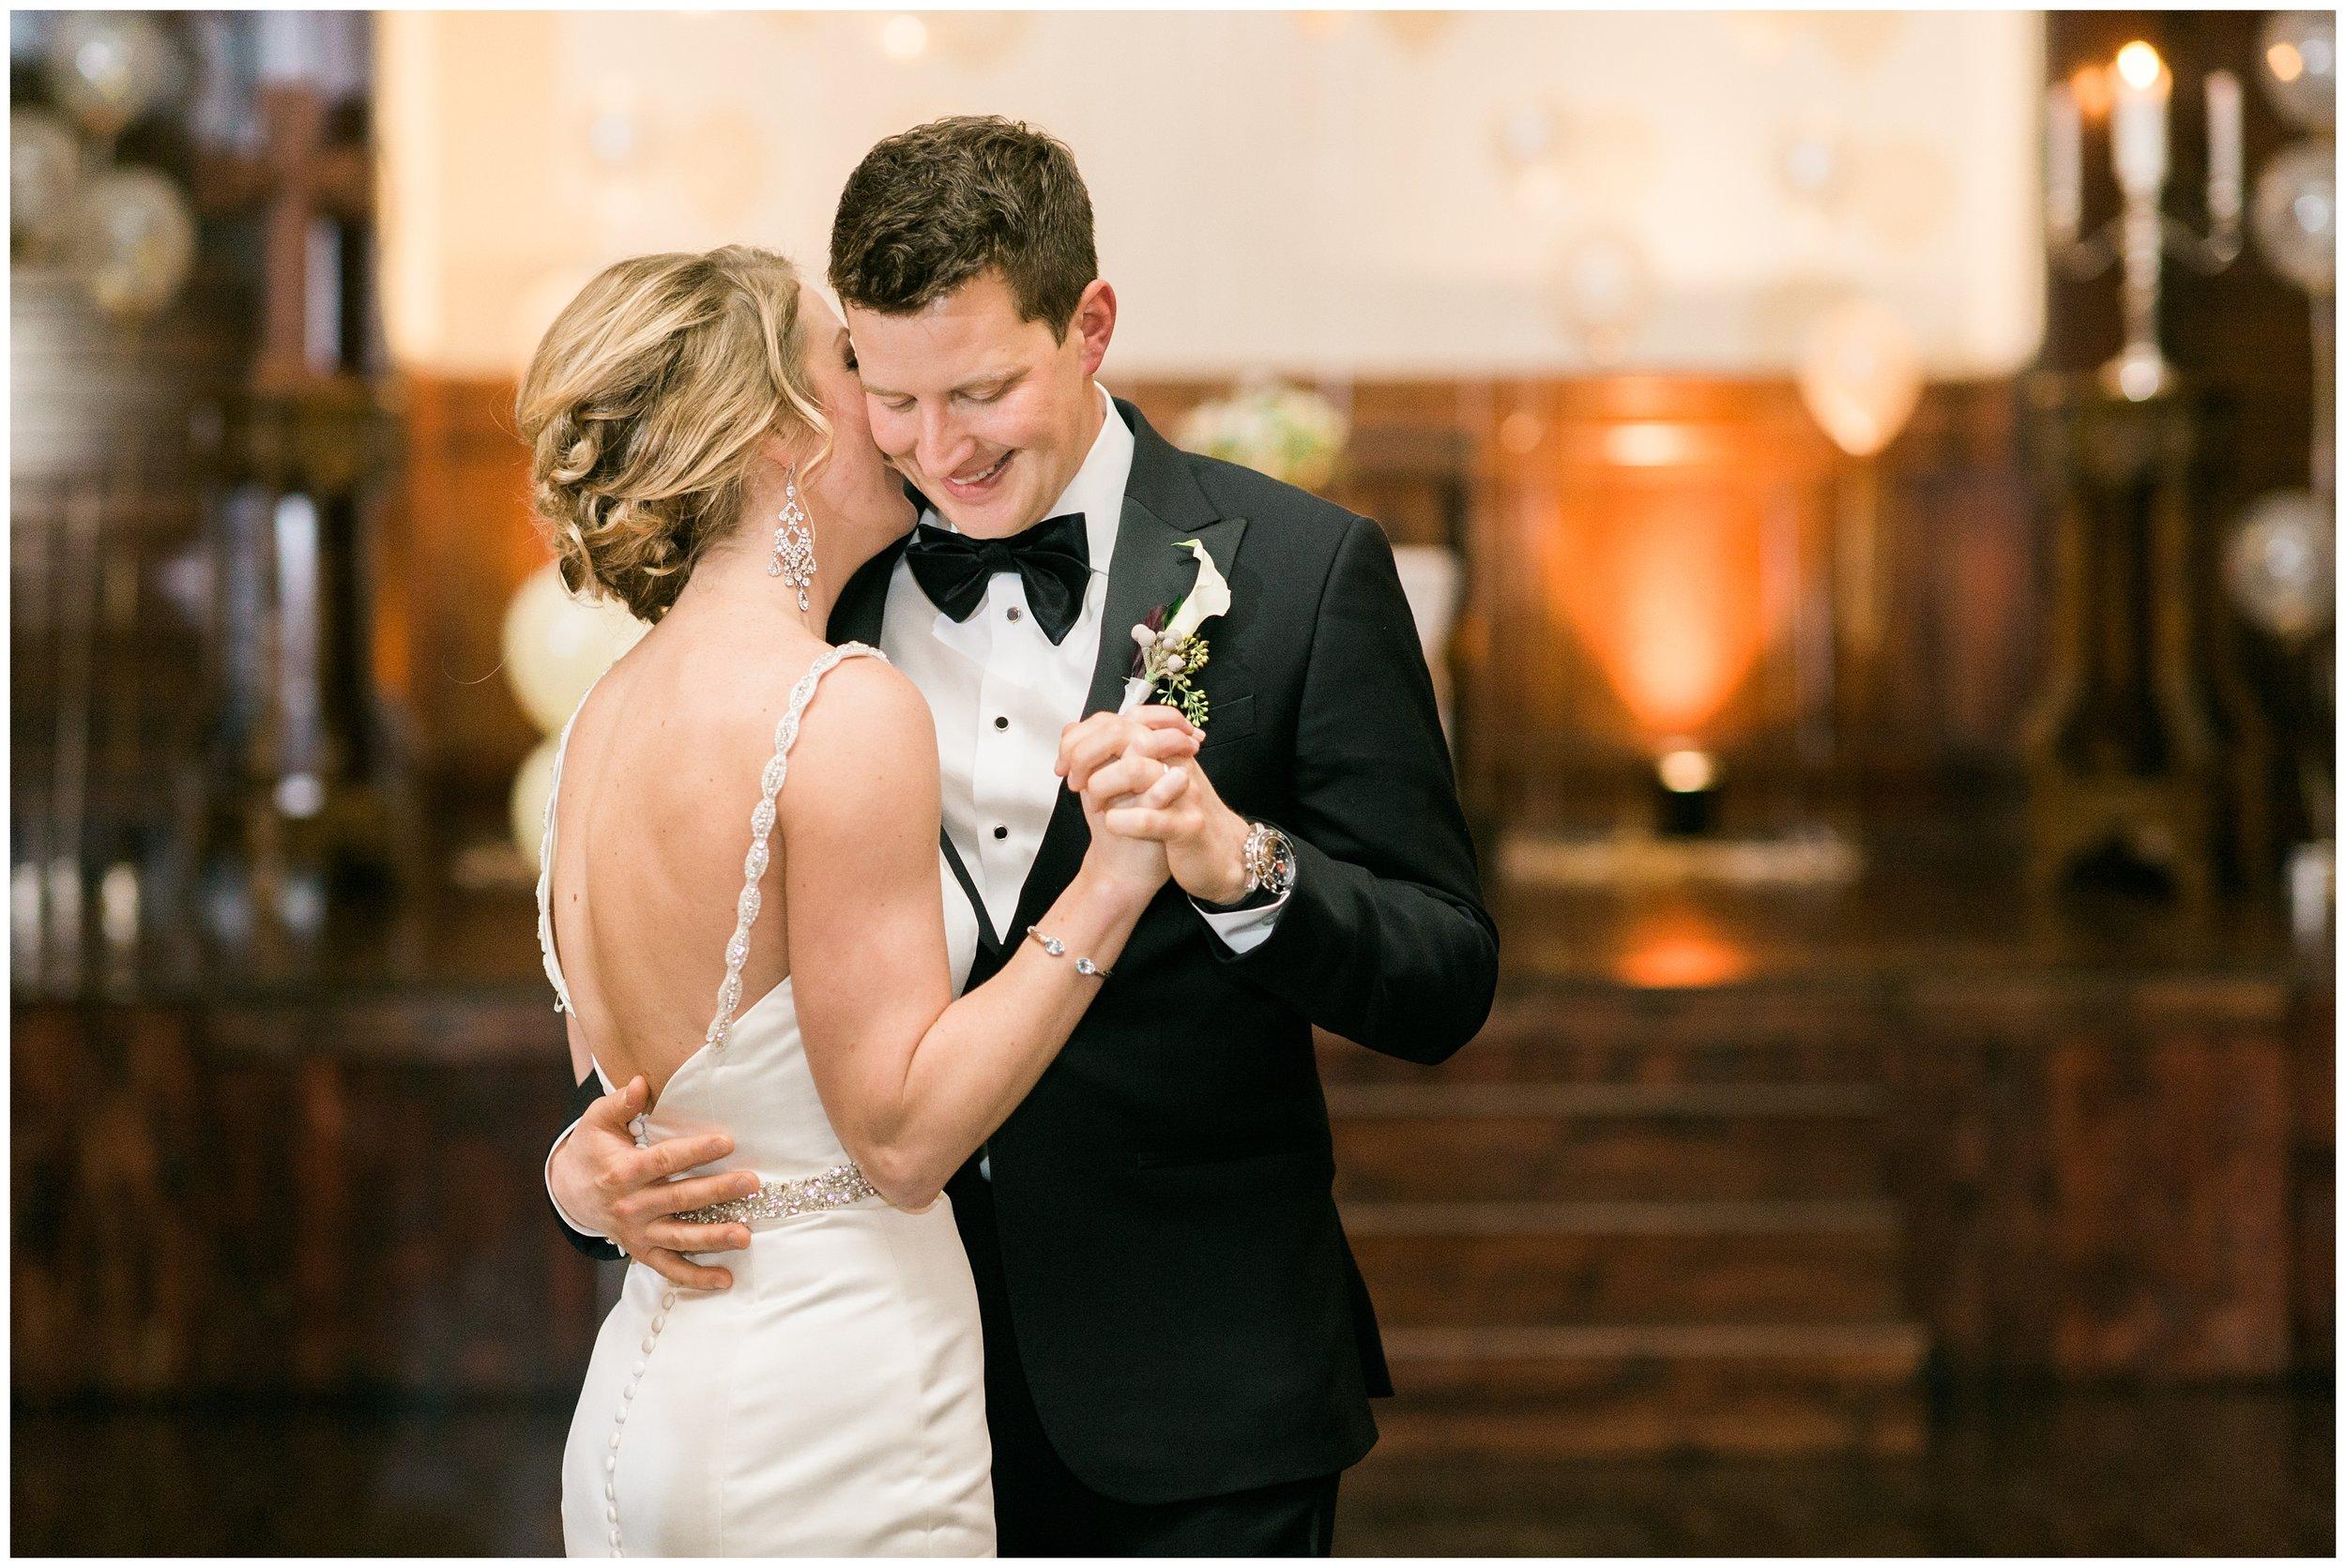 Rebecca_Bridges_Photography_Indianapolis_Wedding_Photographer_5850.jpg